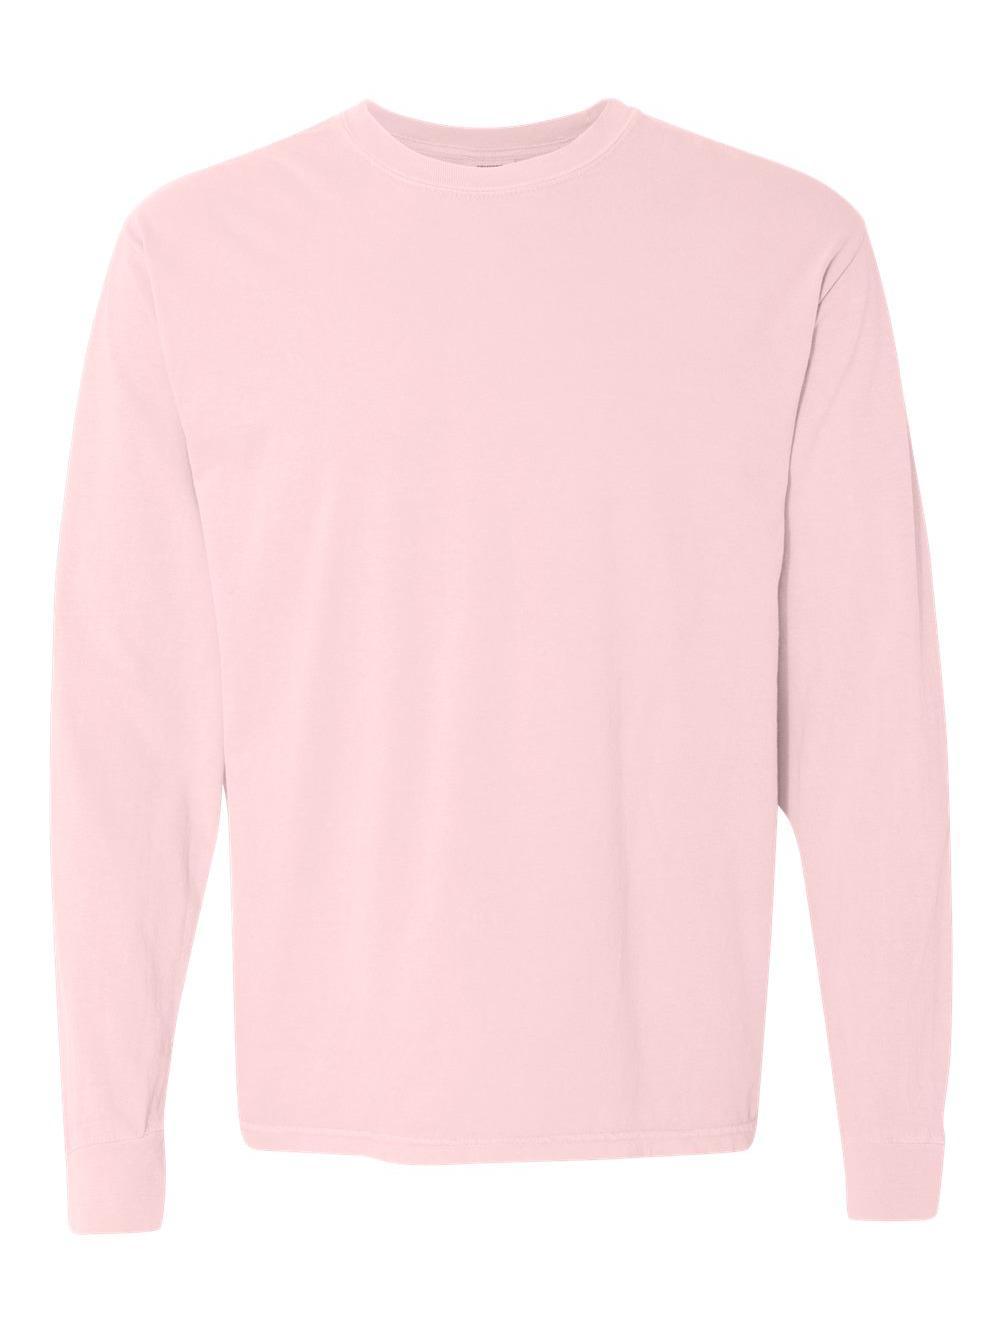 Comfort-Colors-Garment-Dyed-Heavyweight-Ringspun-Long-Sleeve-T-Shirt-6014 thumbnail 9